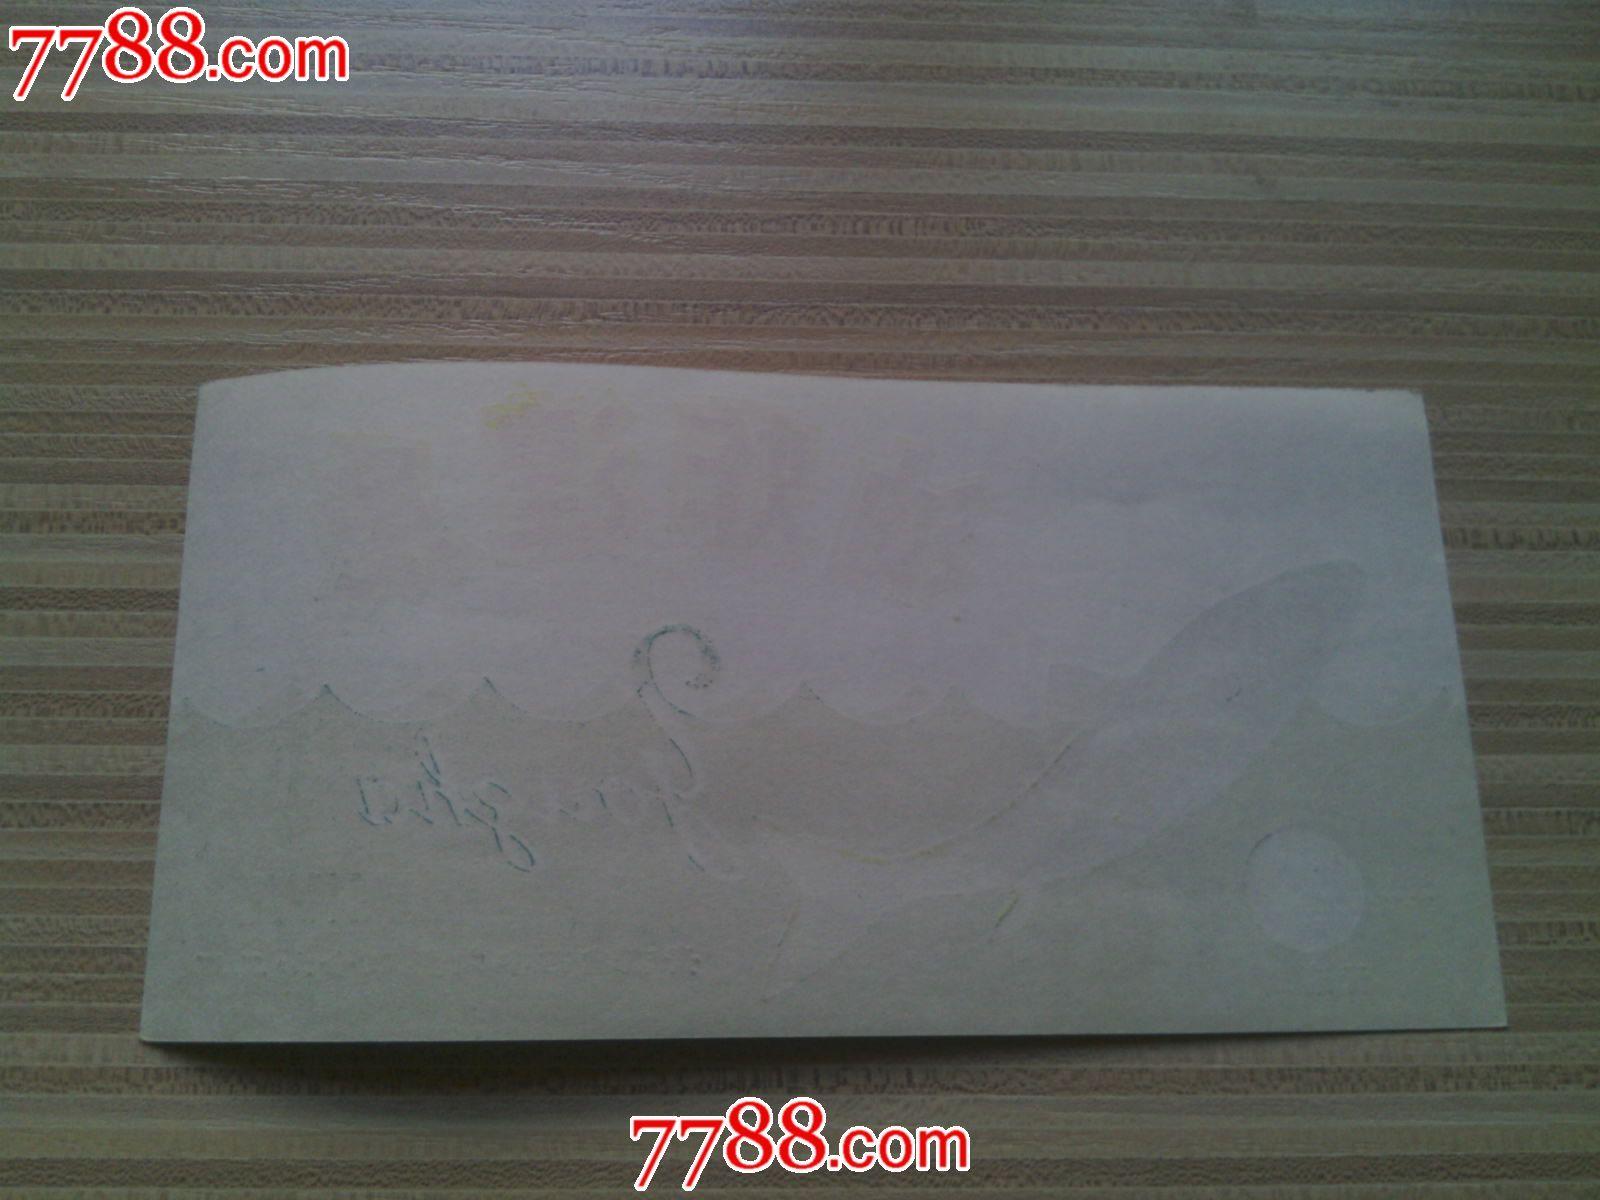 青海湖湟鱼现为国家?;び?价格:15元-se2196